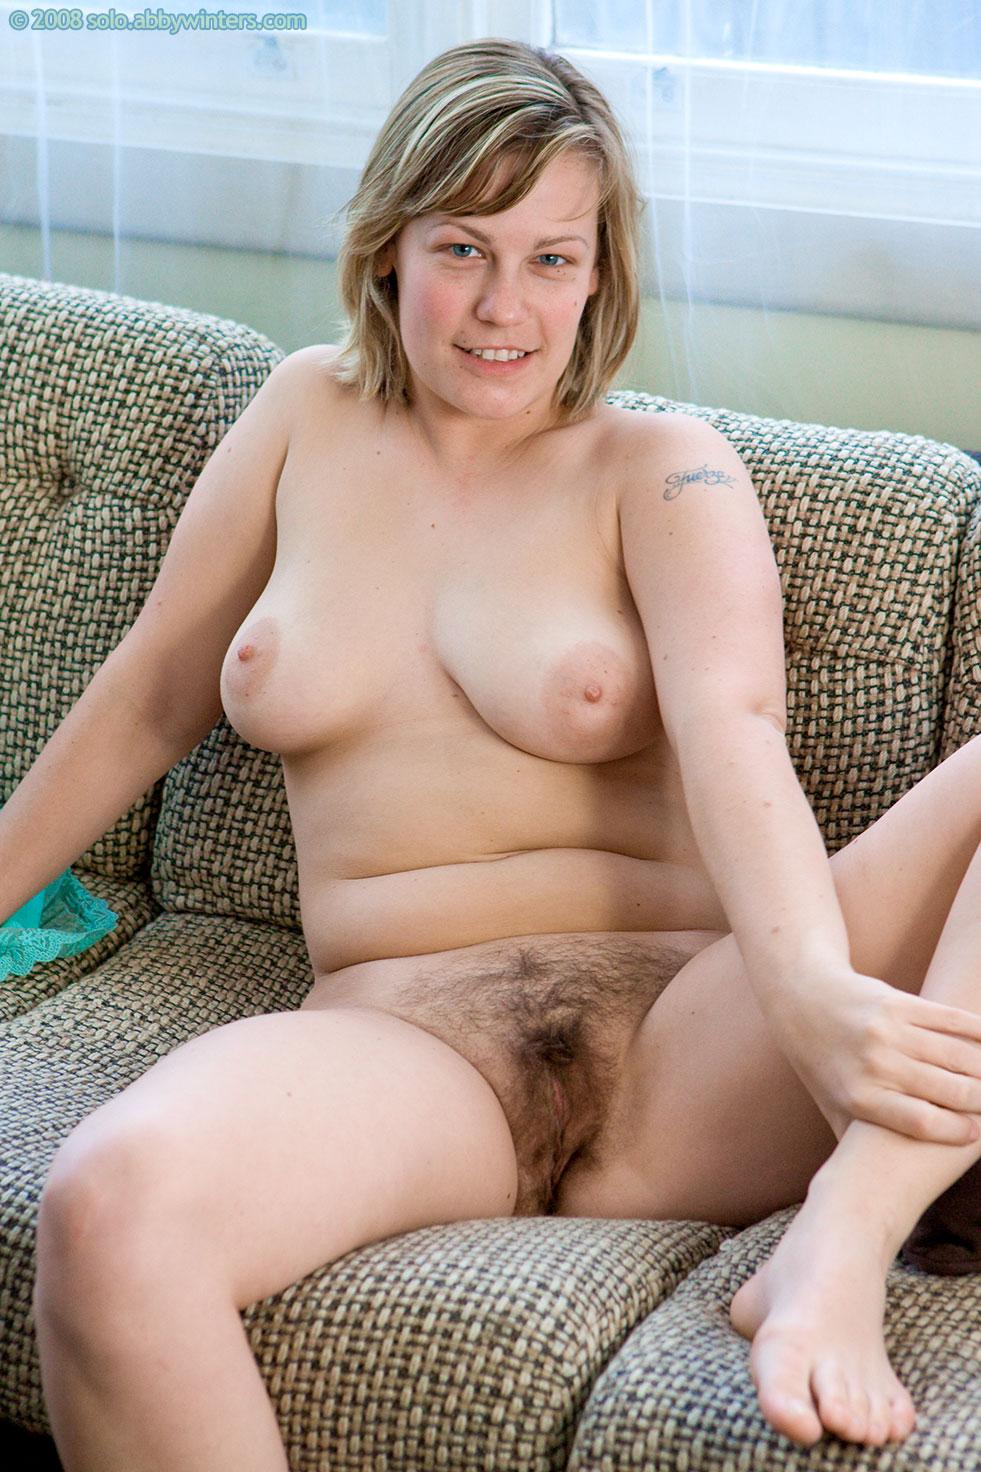 Ashley monroe and blake shelton dating again 8